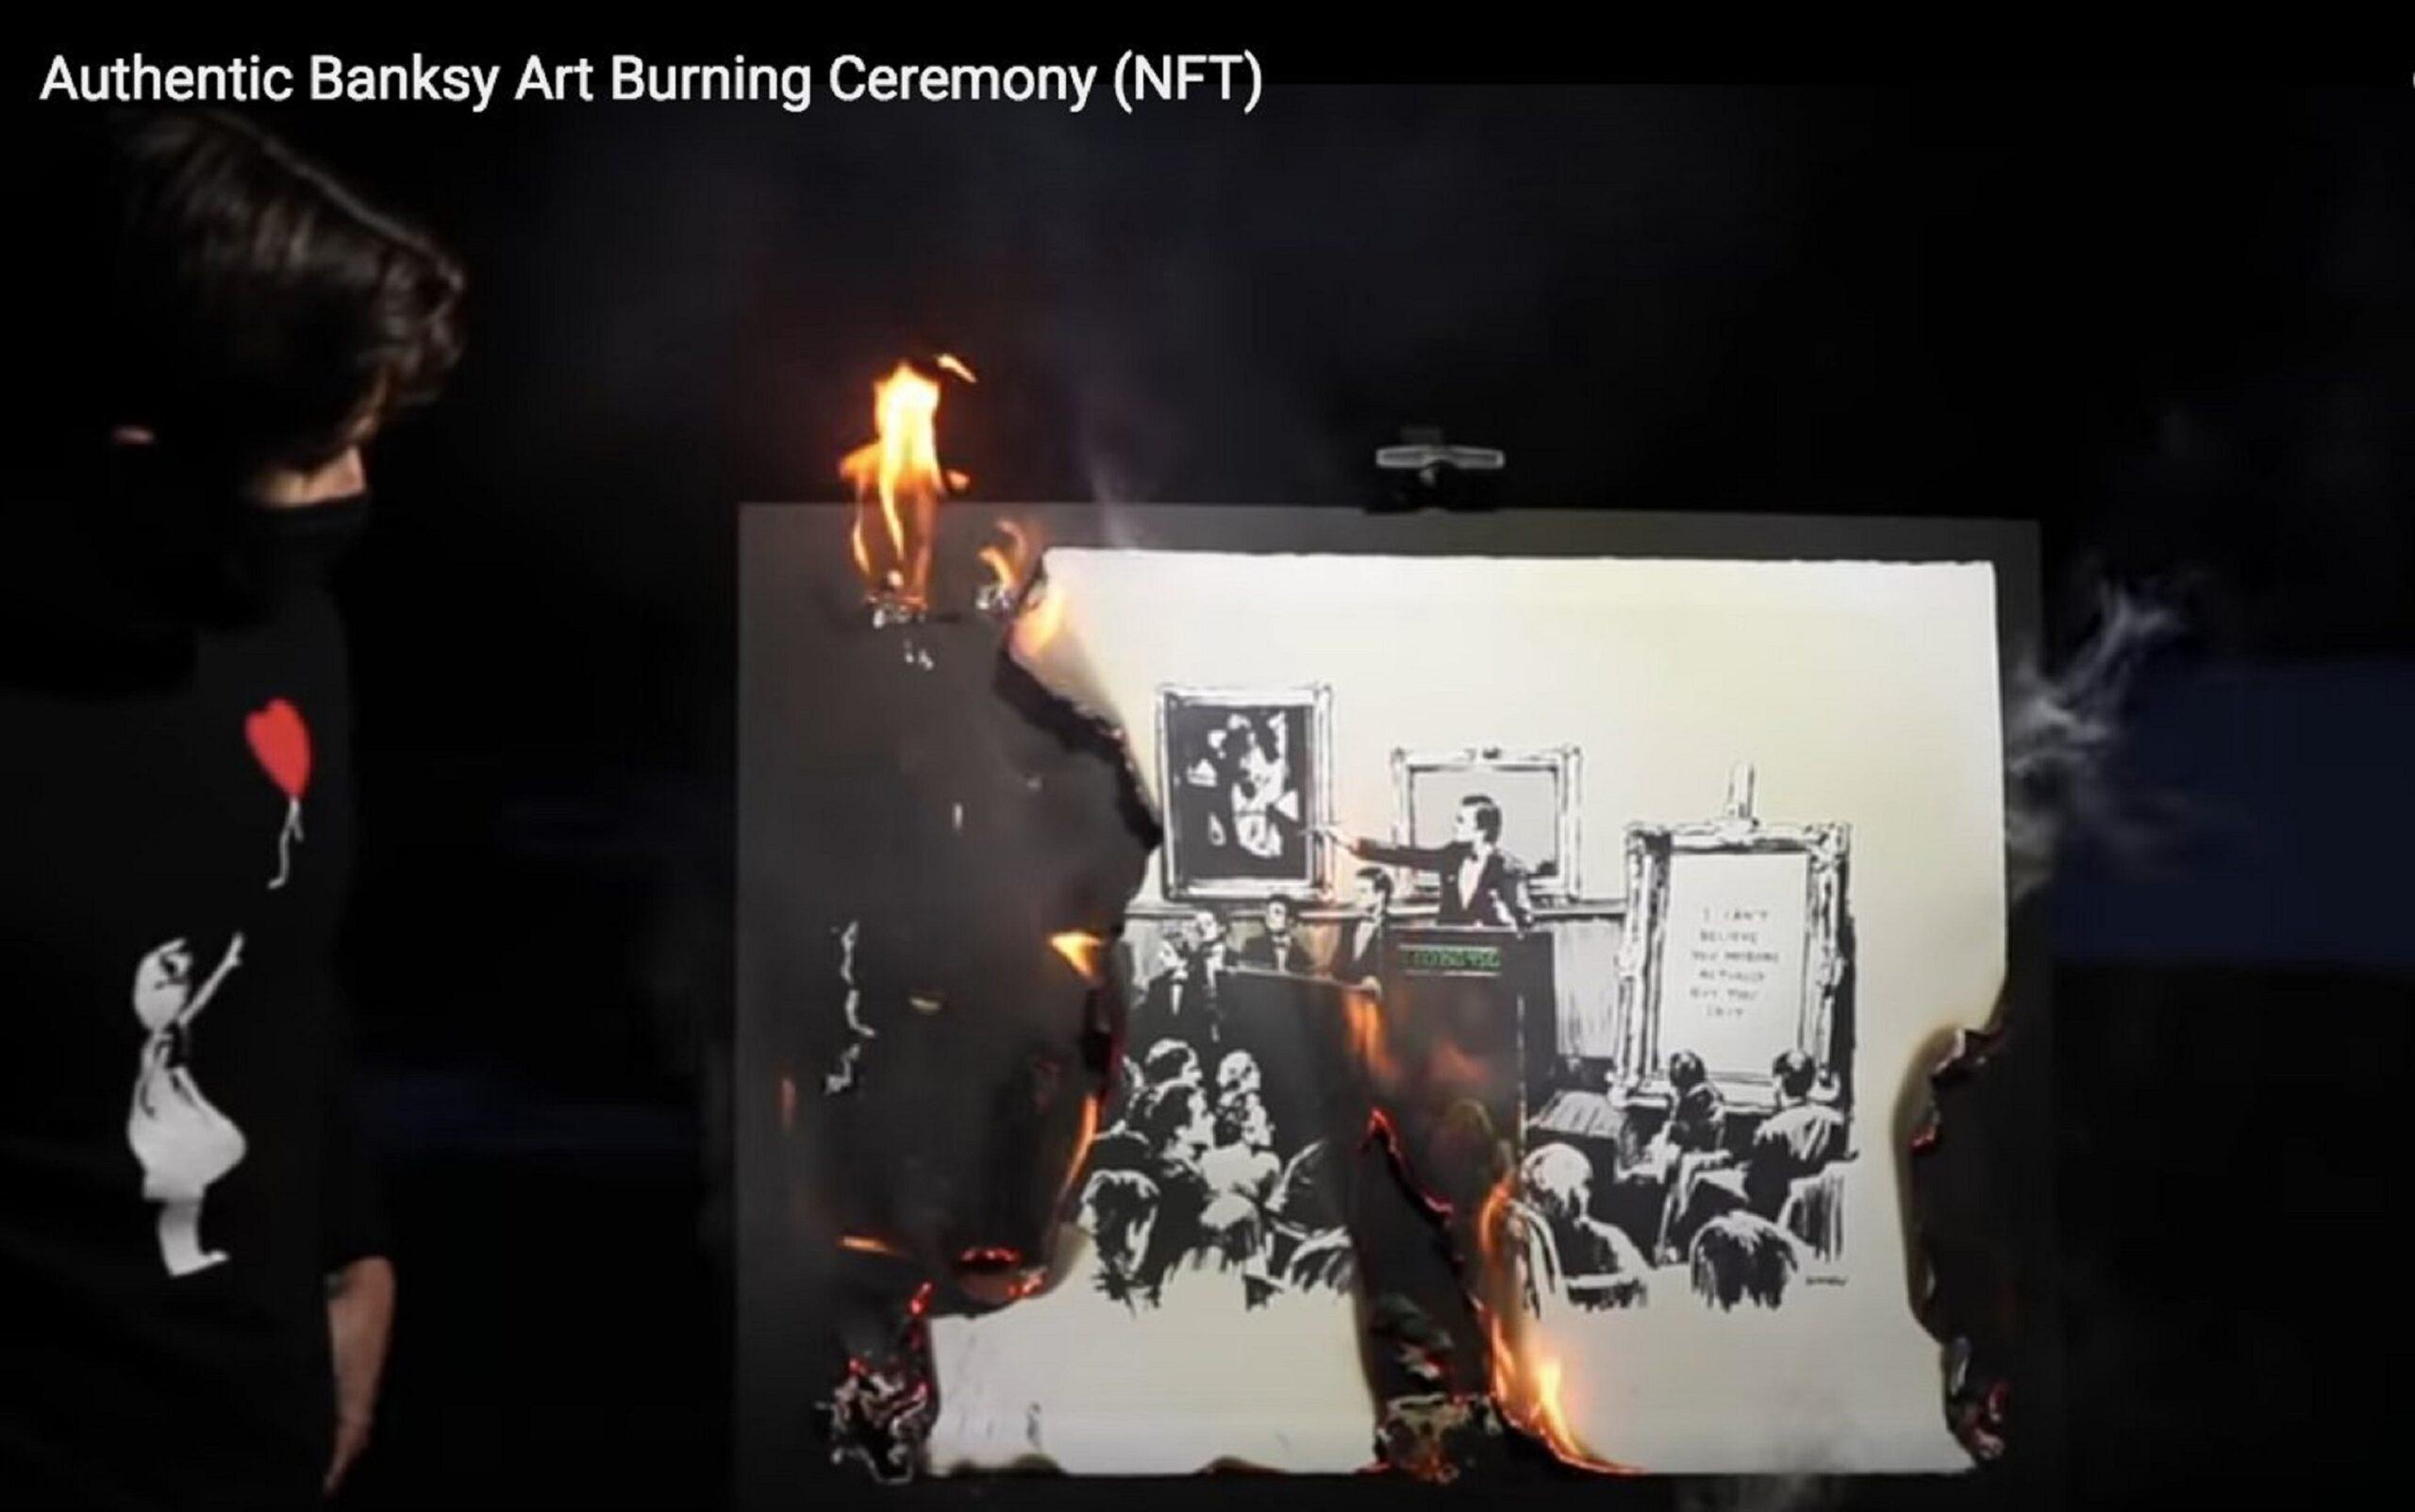 Un altro Banksy distrutto. Bruciato, per trasformarlo in un NFT